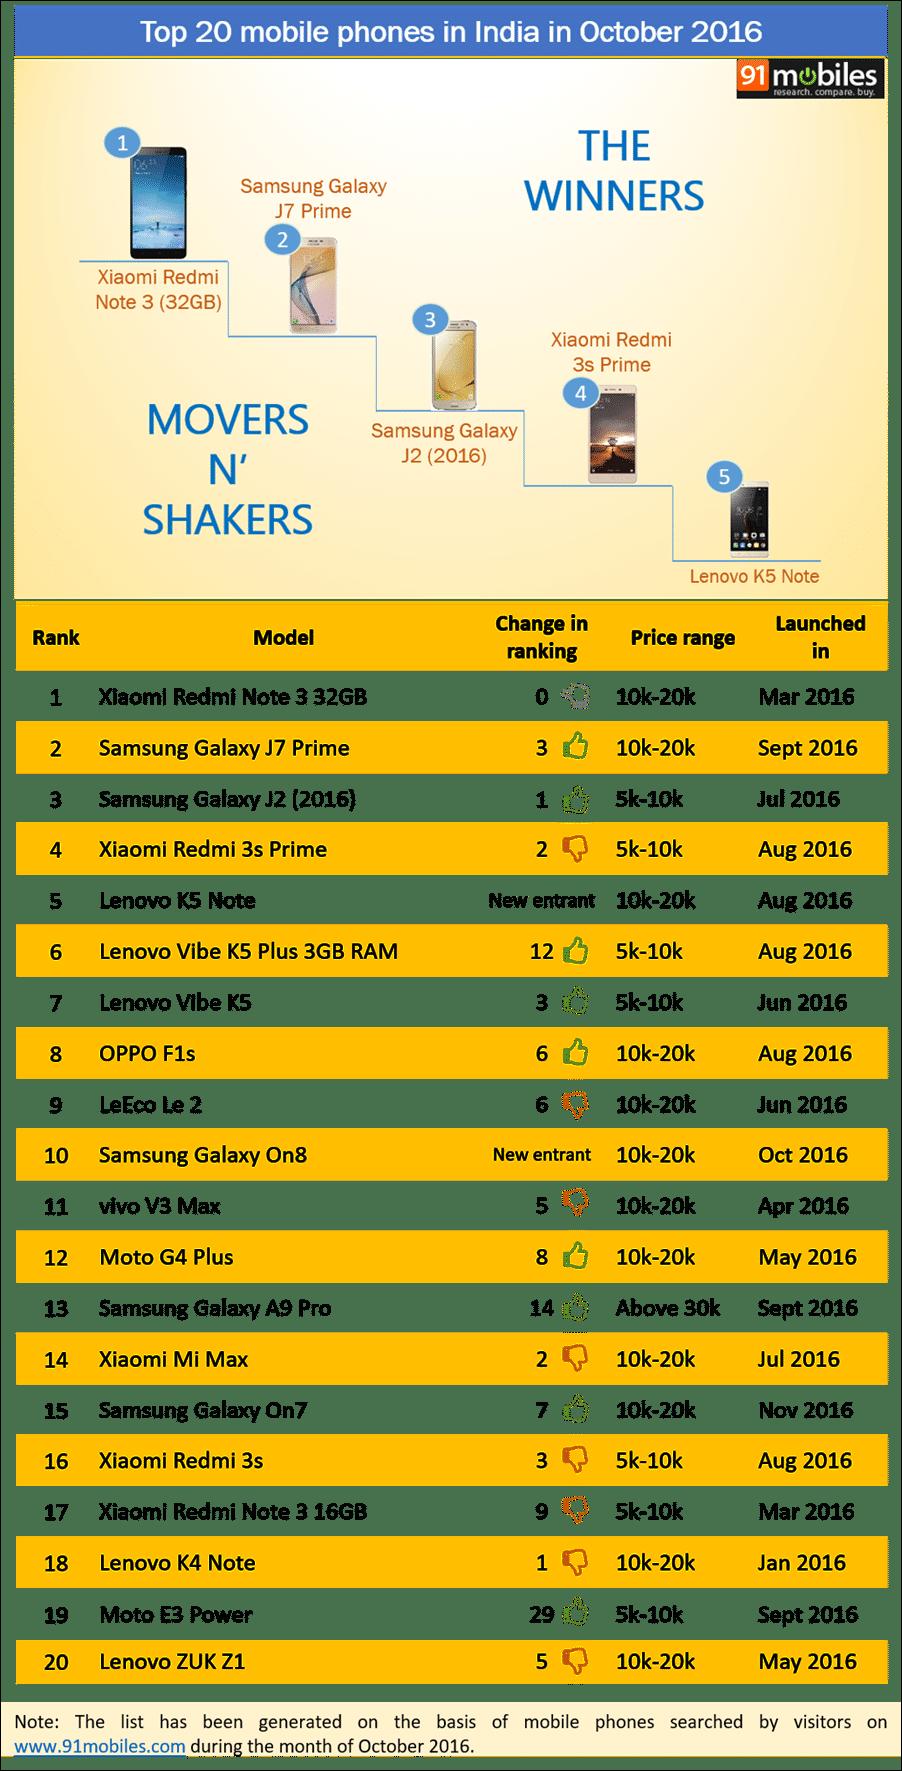 Top 20 mobile phones in India in October 2016 - 91mobiles